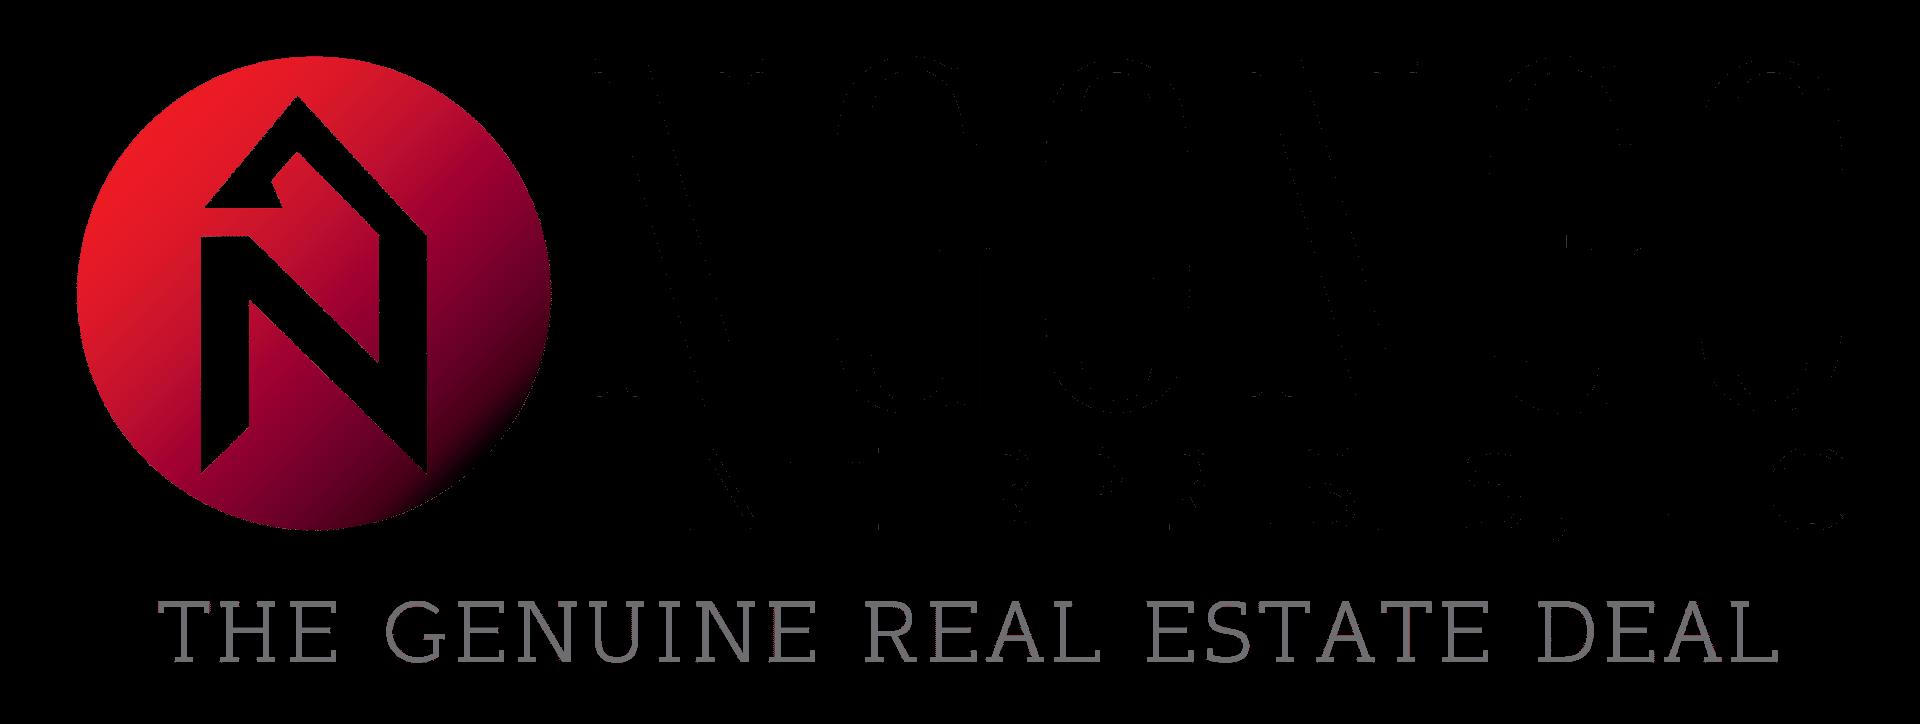 NGONGO ENTERPRISES, LLC logo